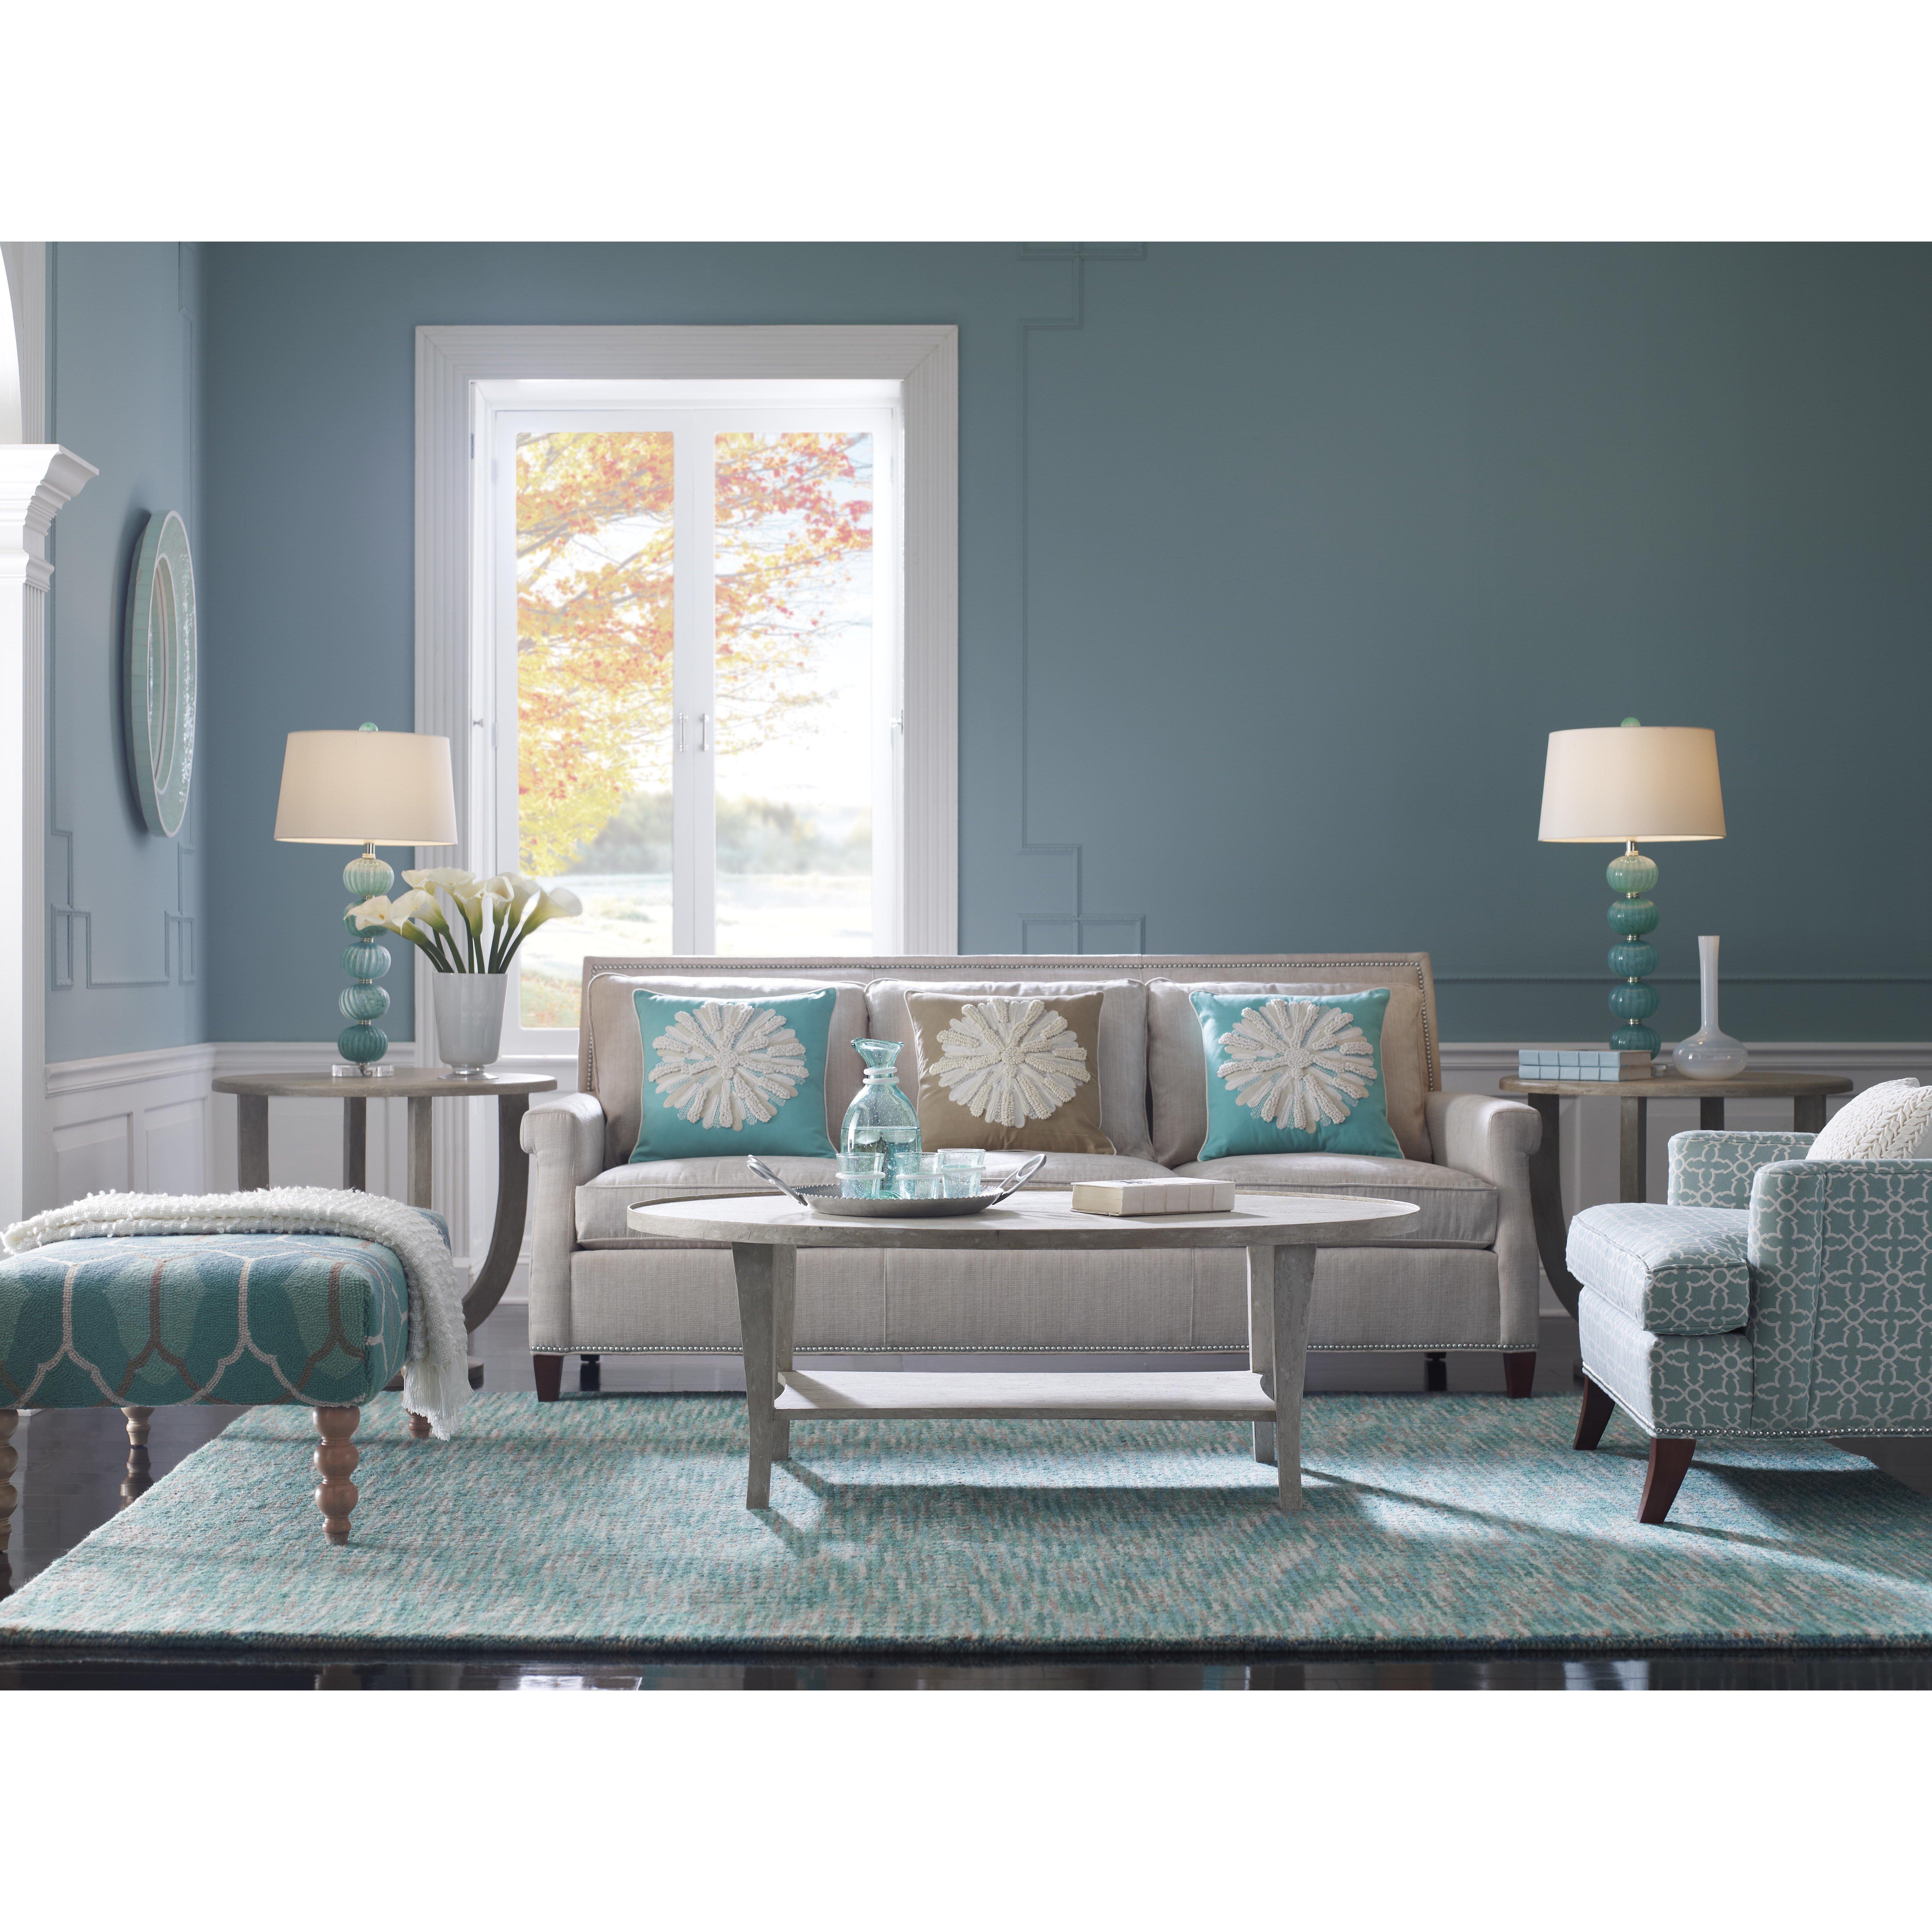 Company c tweedy lake machine woven blue area rug